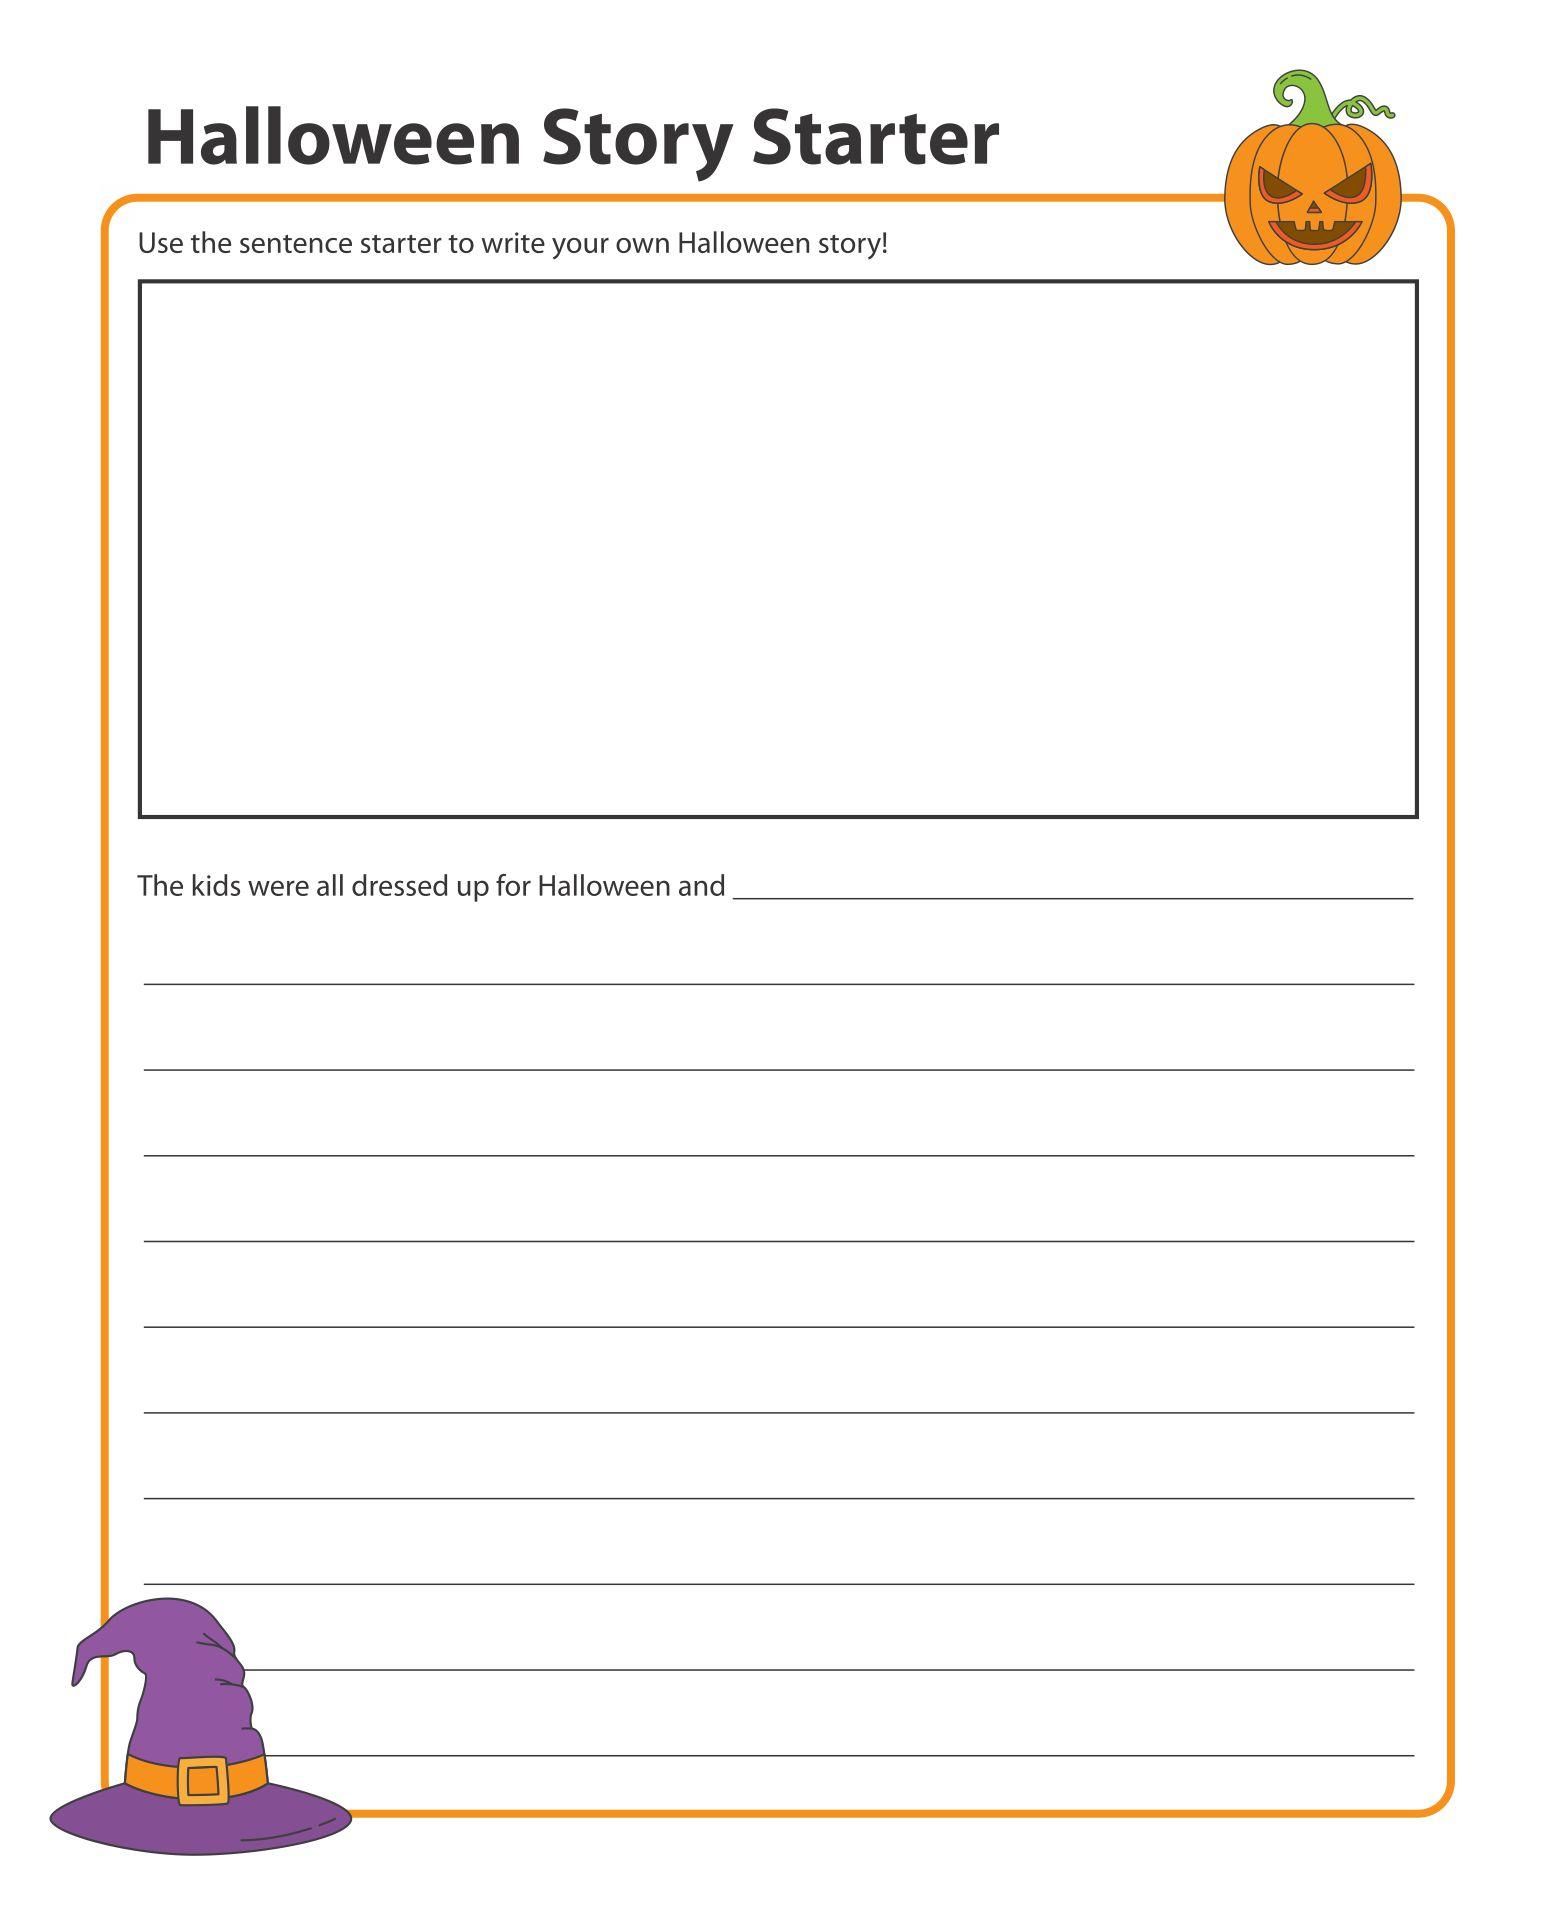 Printable Halloween Story Starters For Kids